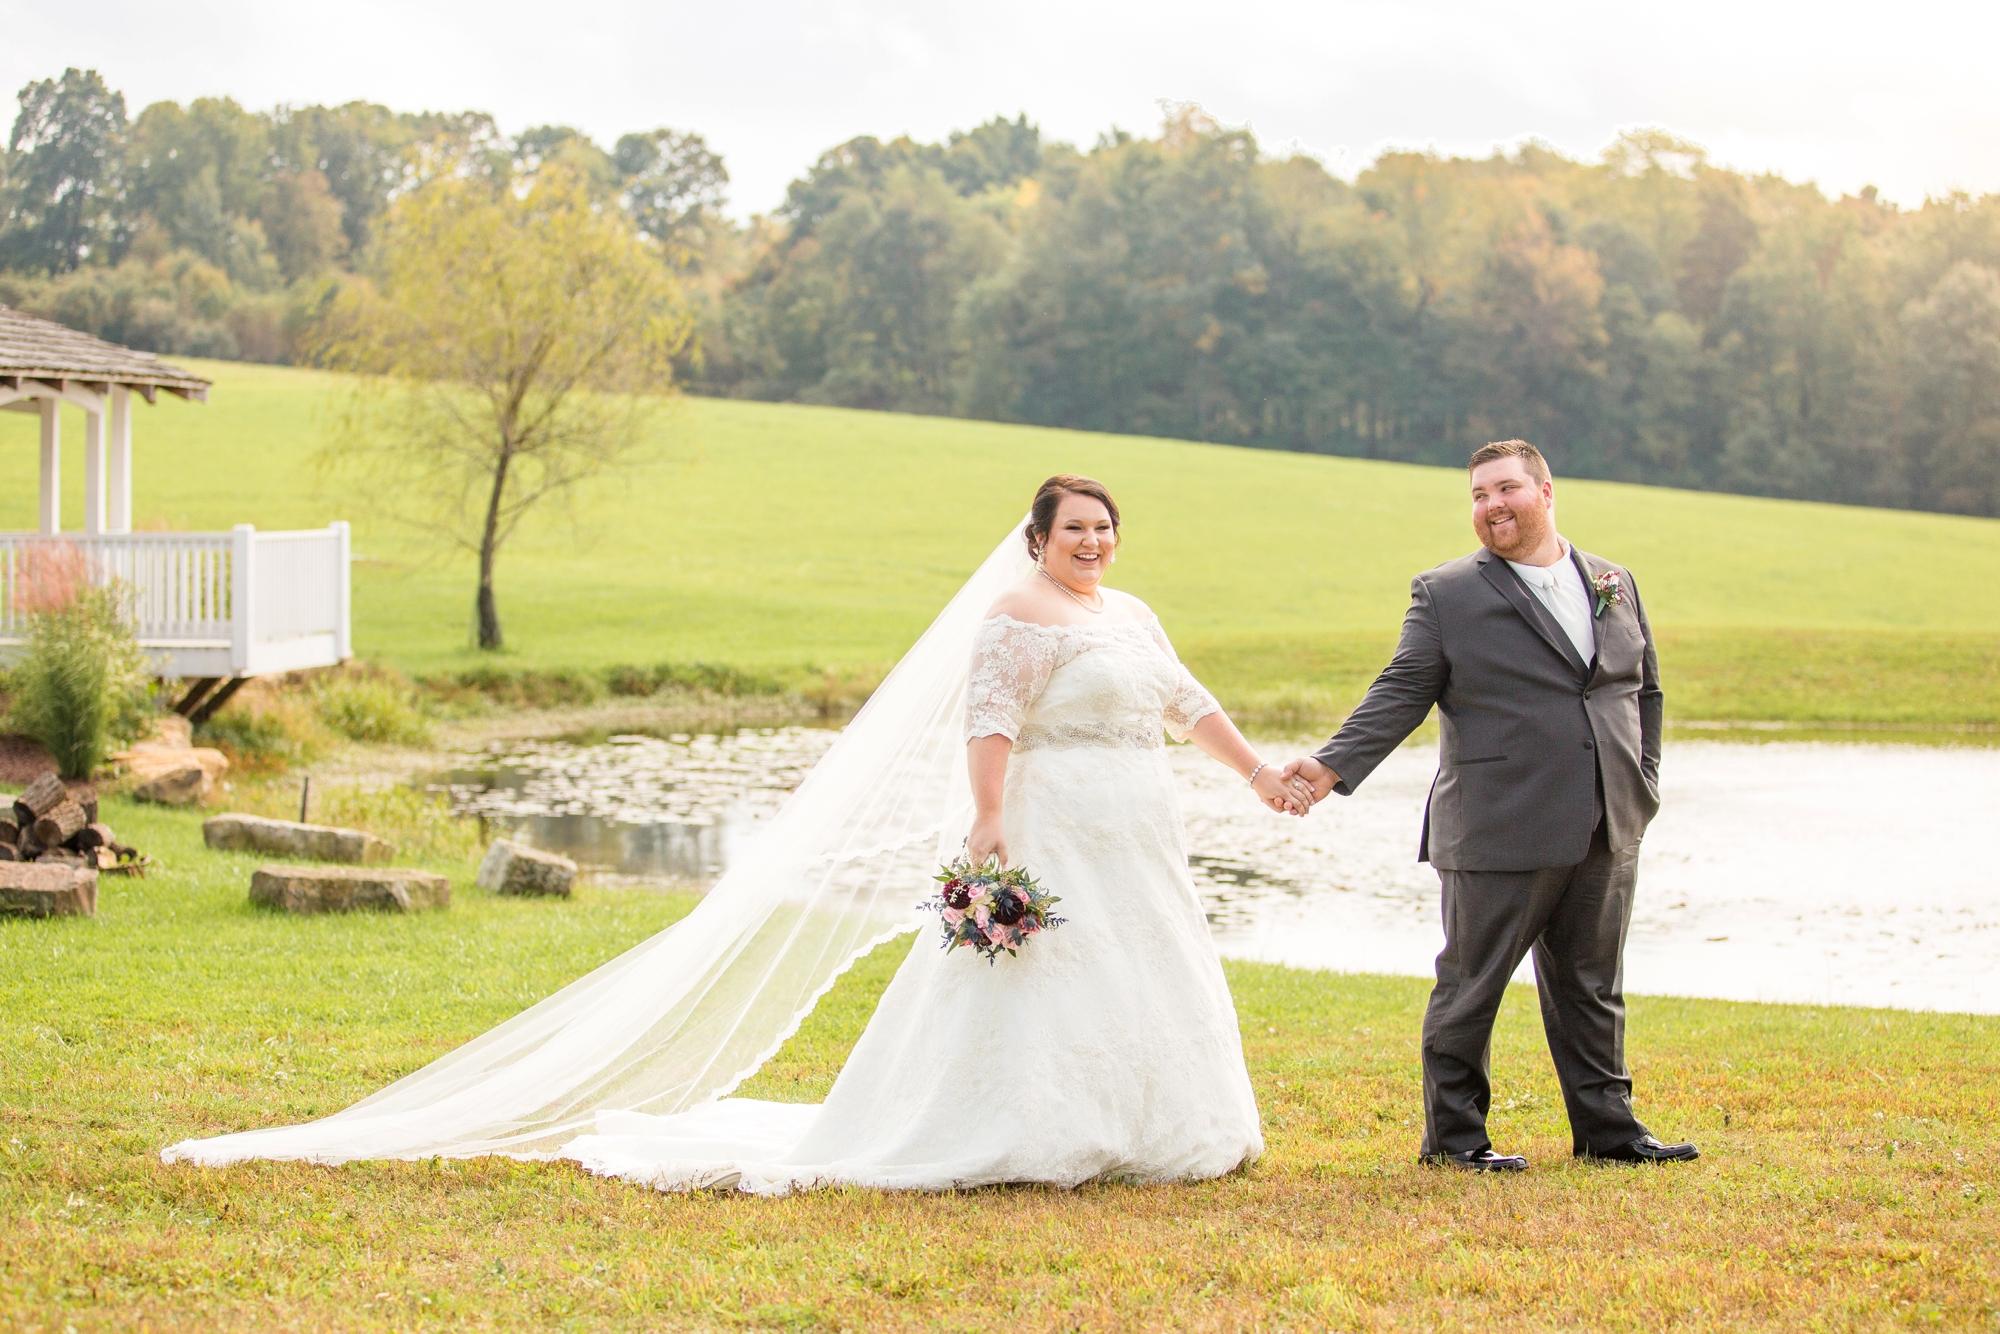 pittsburgh wedding photographer, pittsburgh wedding venues, pittsburgh wedding photos, renshaw family farms wedding photos, white barn wedding photos